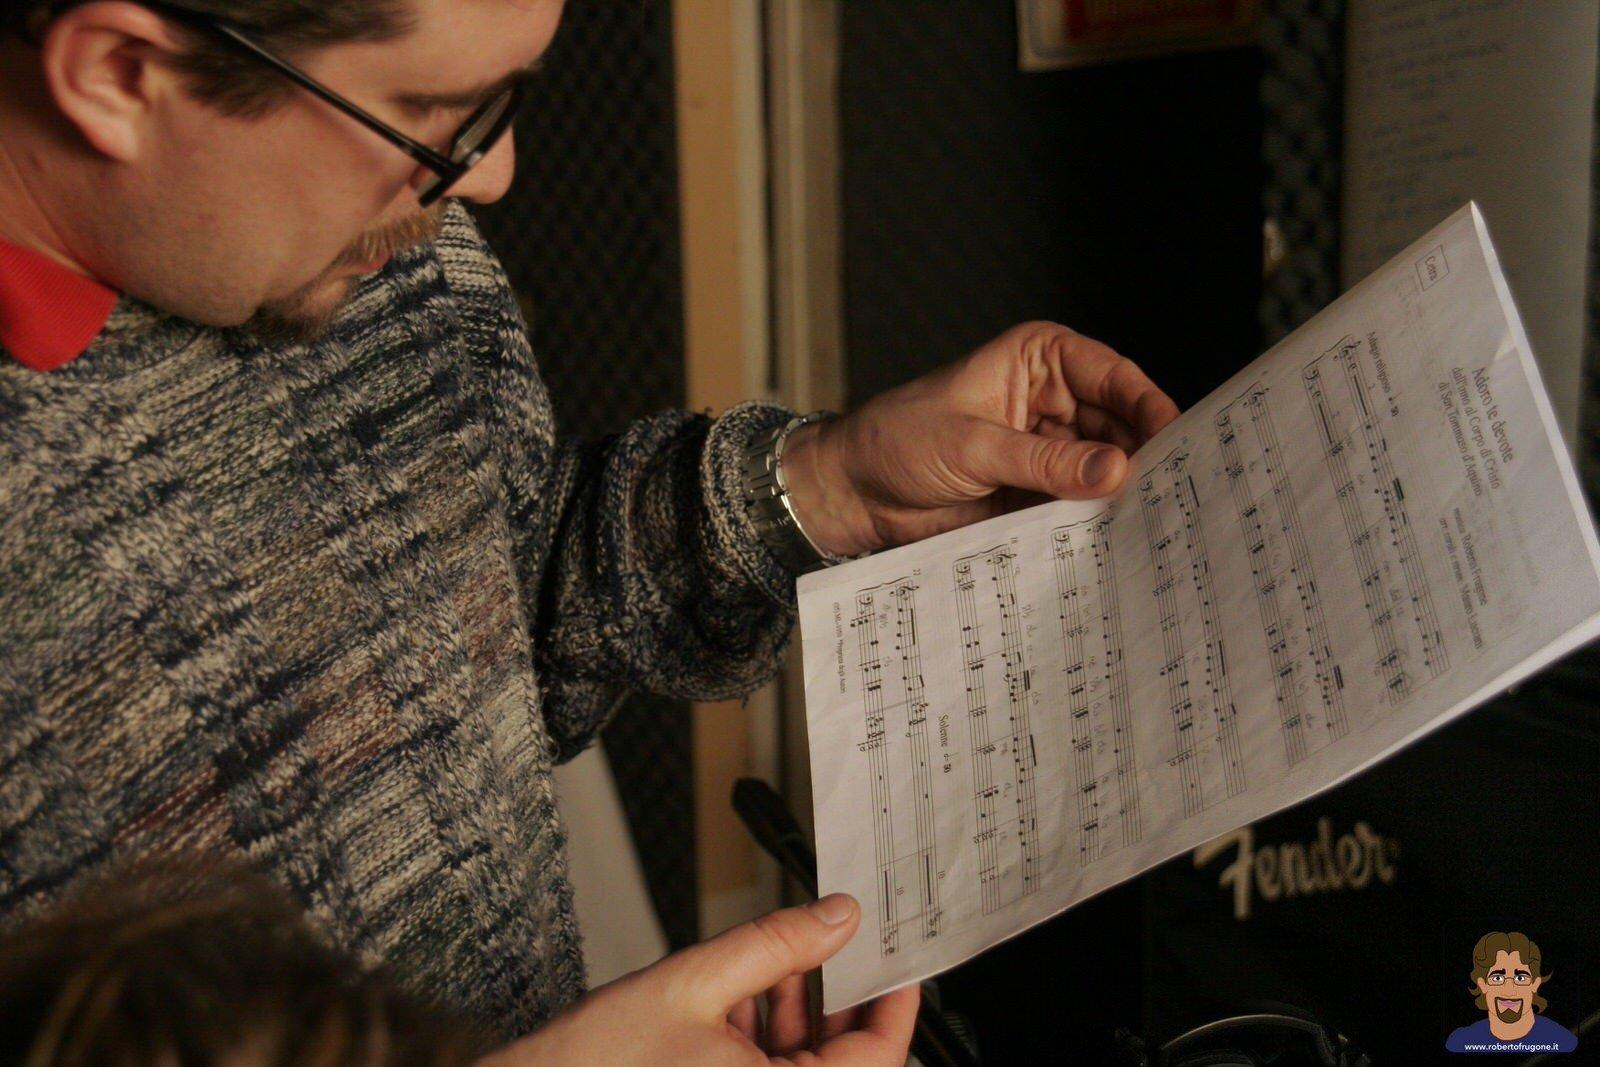 Totem Studio Sala Prove Musicali Casarza Ligure Roberto Frugone spartito – foto Lamberto Salvan